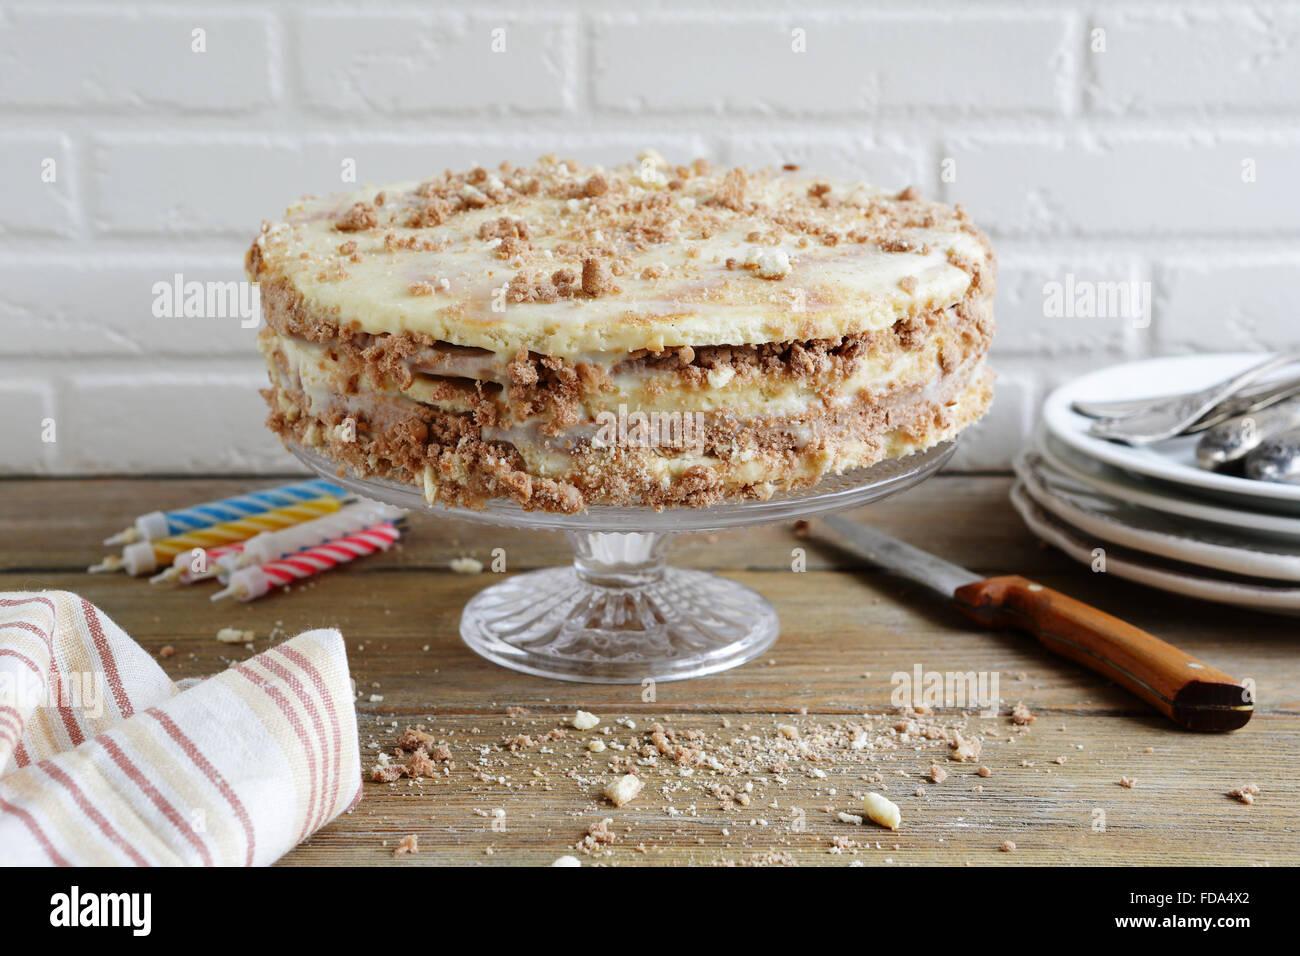 homemade birthday cake on stand - Stock Image